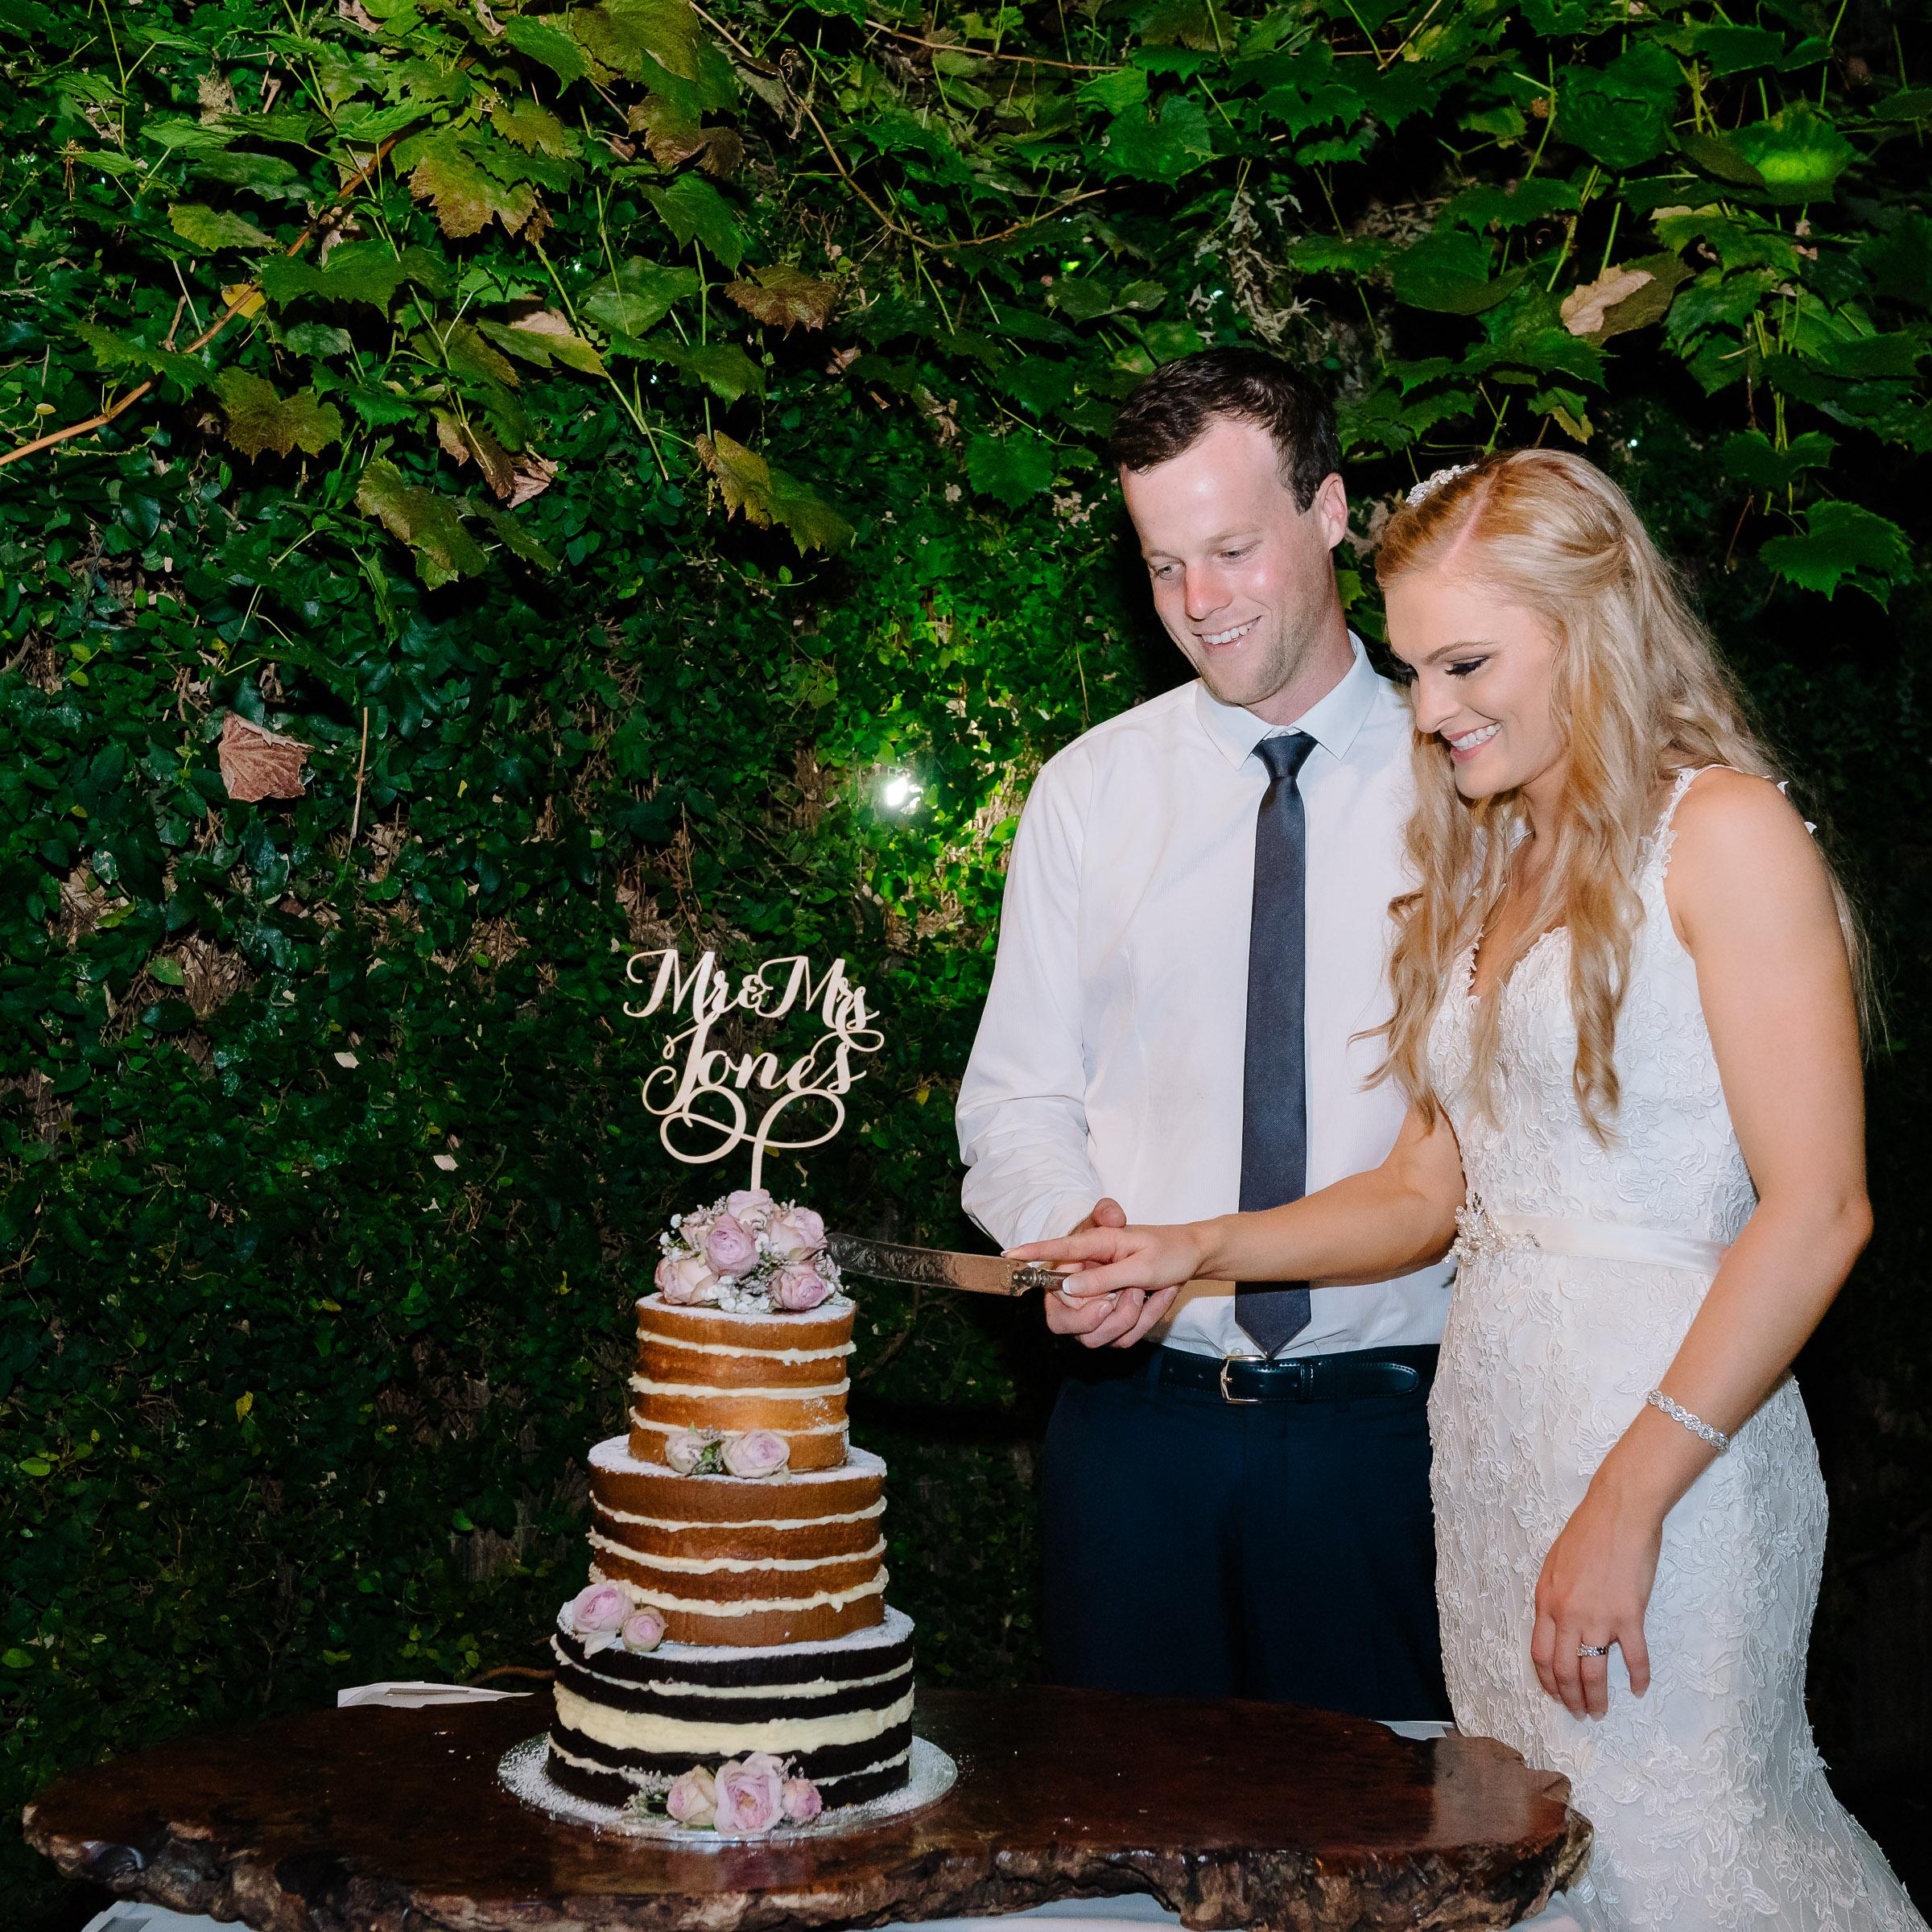 Radcliffes Wedding Cake Cutting - Wedding Photographer Echuca